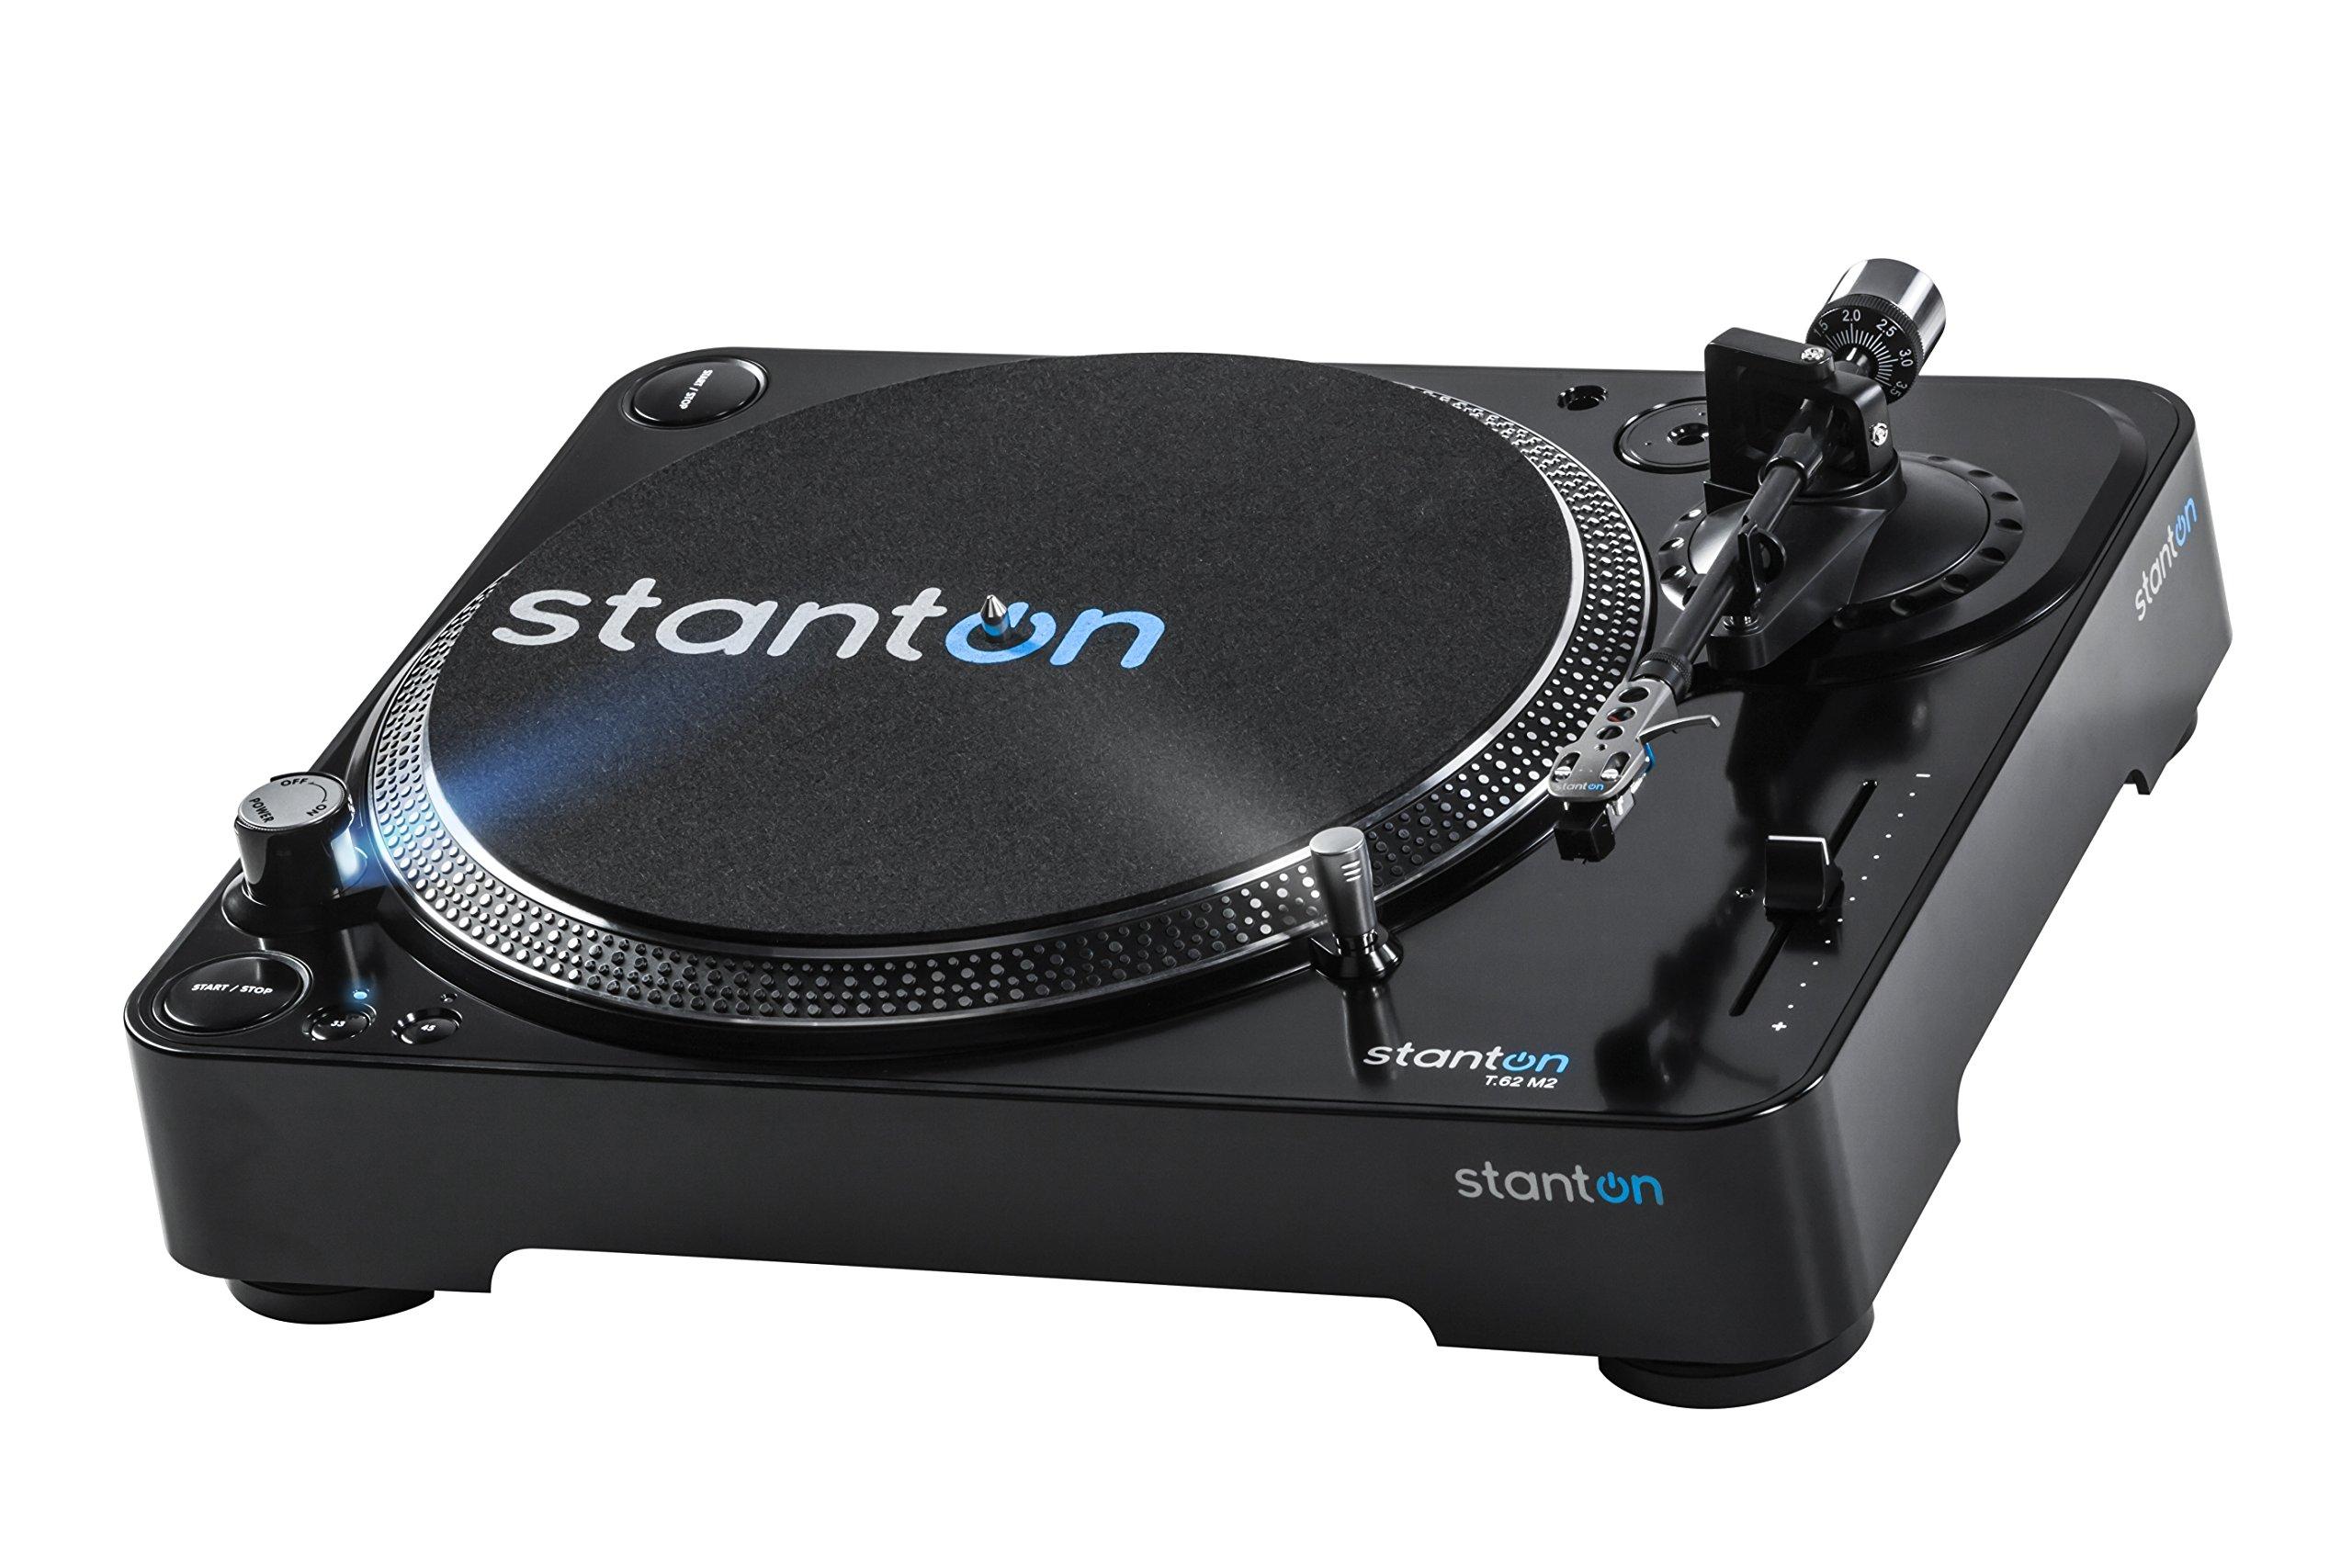 Stanton Professional Direct Turntable Cartridge